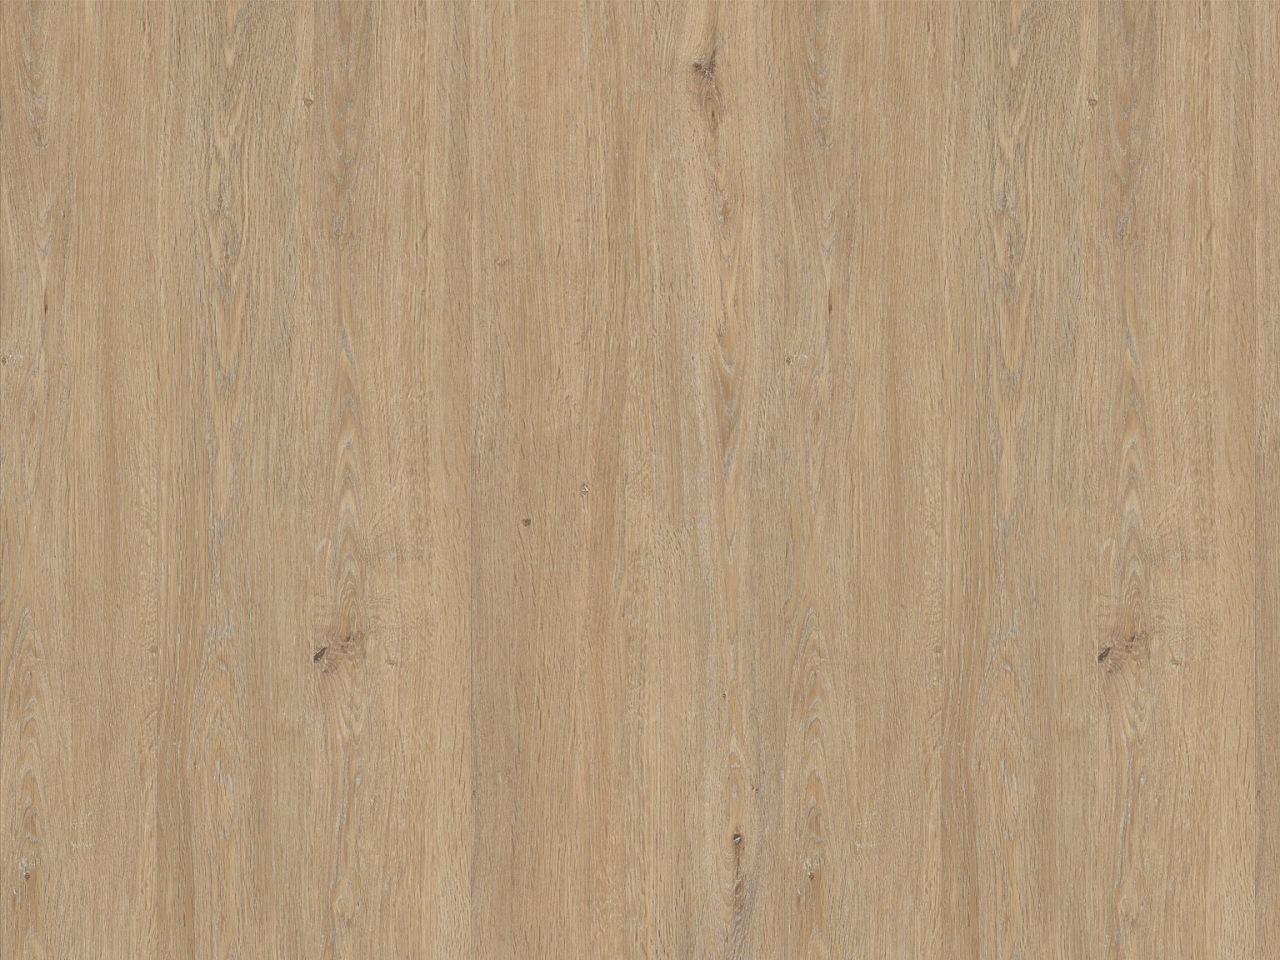 Designbelag Alesso wood – Eiche Brügge, 324003